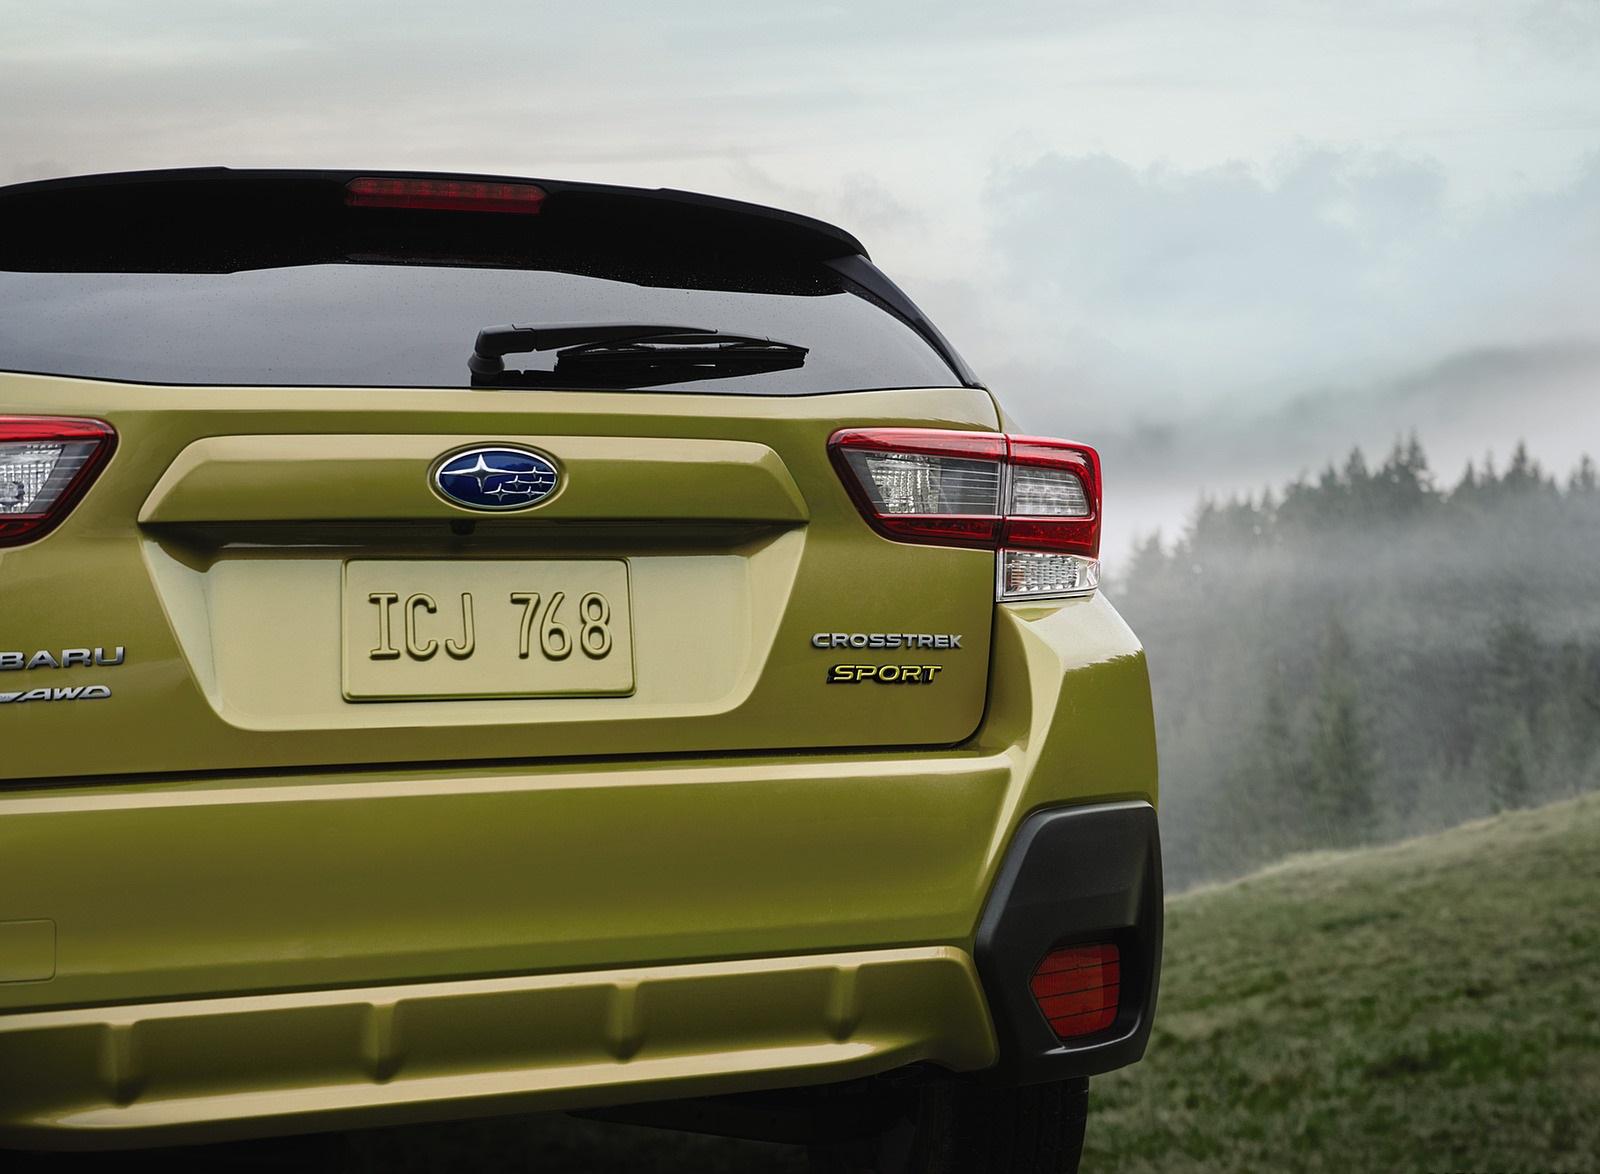 2021 Subaru Crosstrek Sport Tail Light Wallpapers (8)